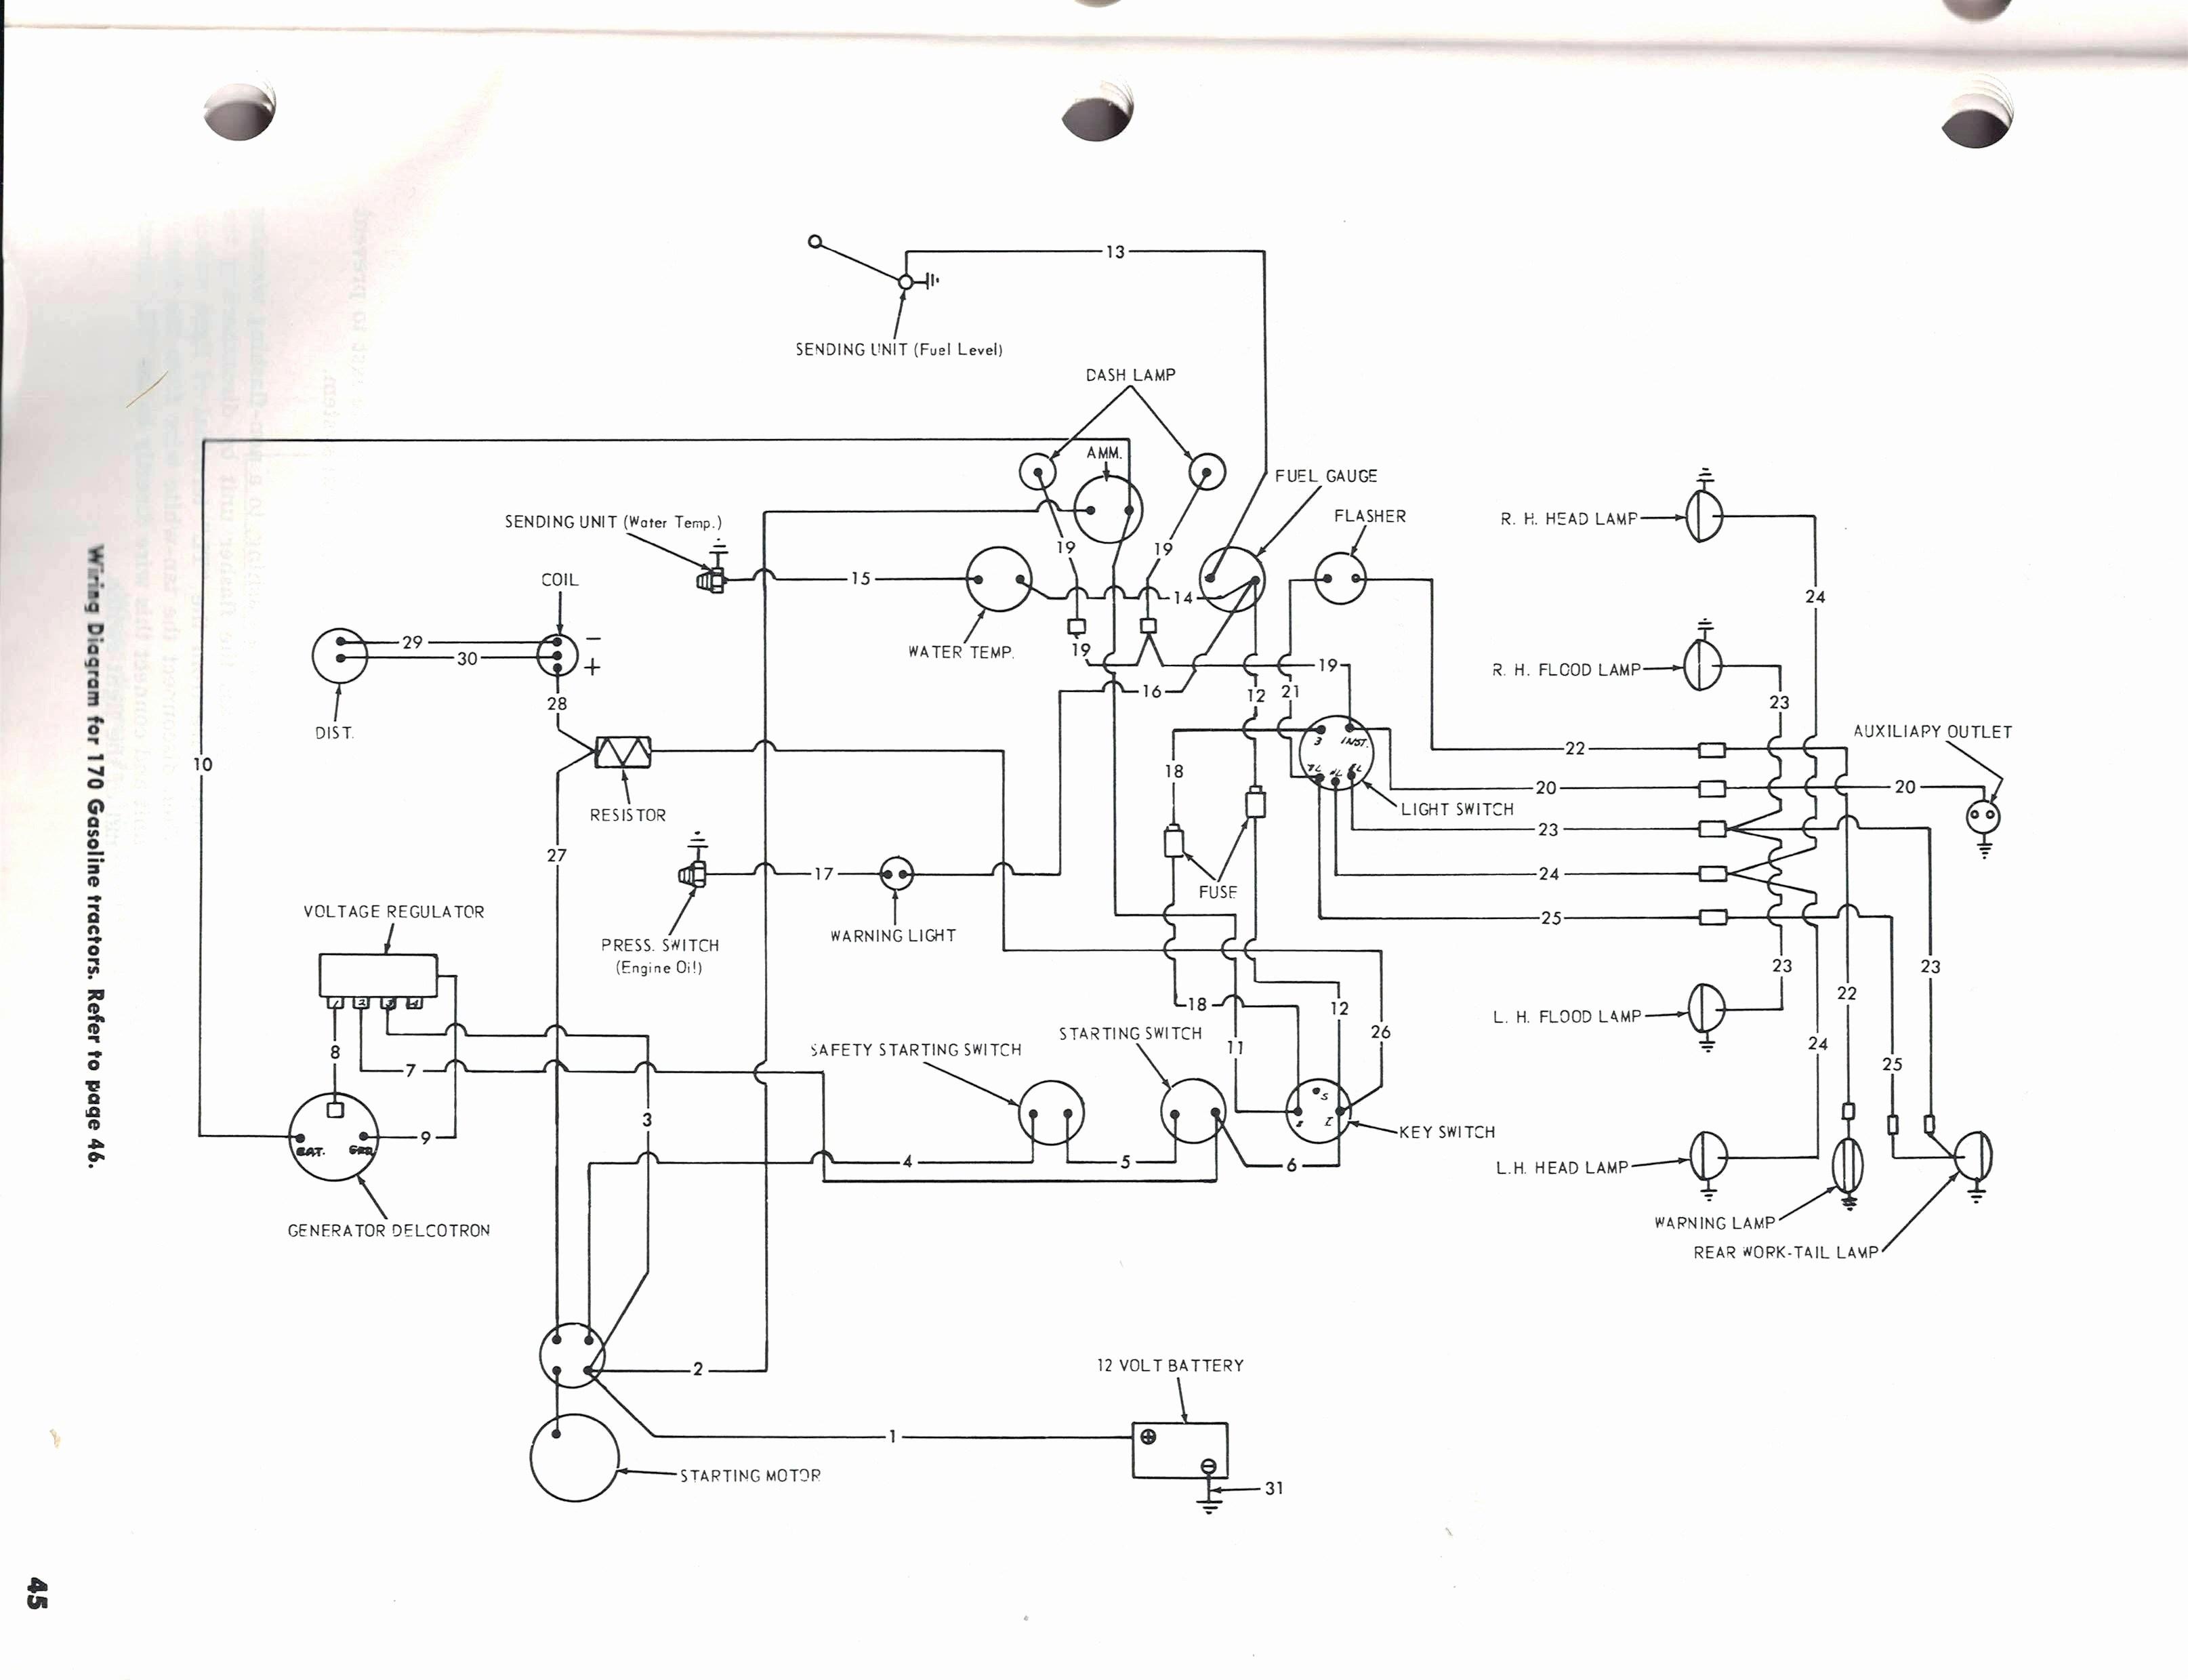 Golden Jubilee Tractor Wiring Diagram - Wiring Diagram Text sum-post -  sum-post.albergoristorantecanzo.it | Ford Jubilee Tractor Wiring Diagram |  | sum-post.albergoristorantecanzo.it